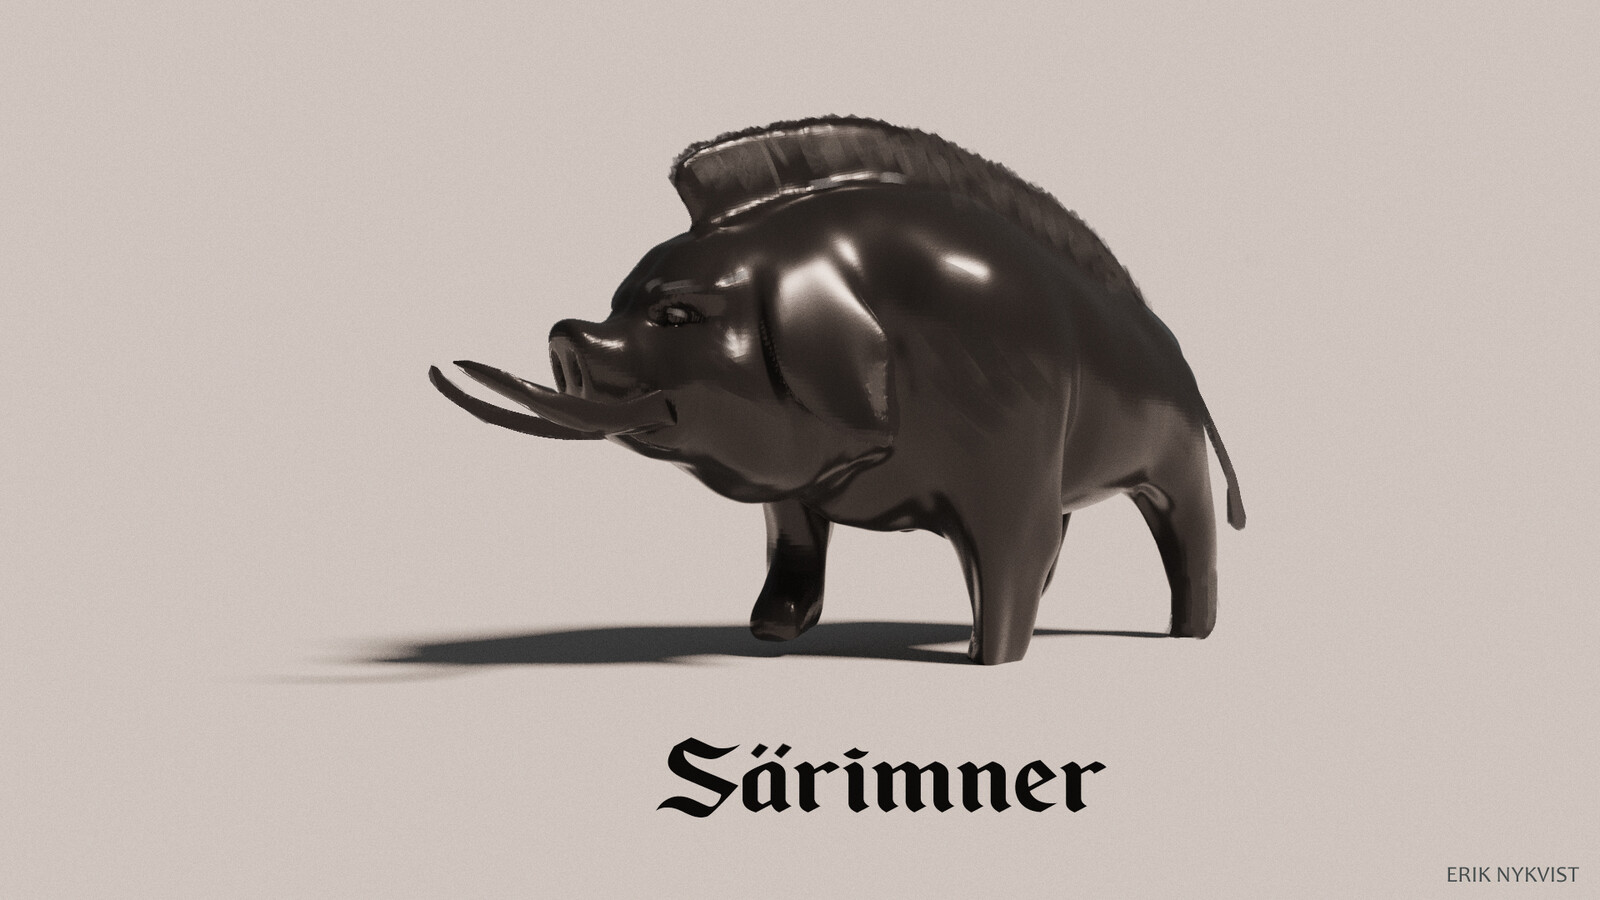 Statue of särimner the great pig.